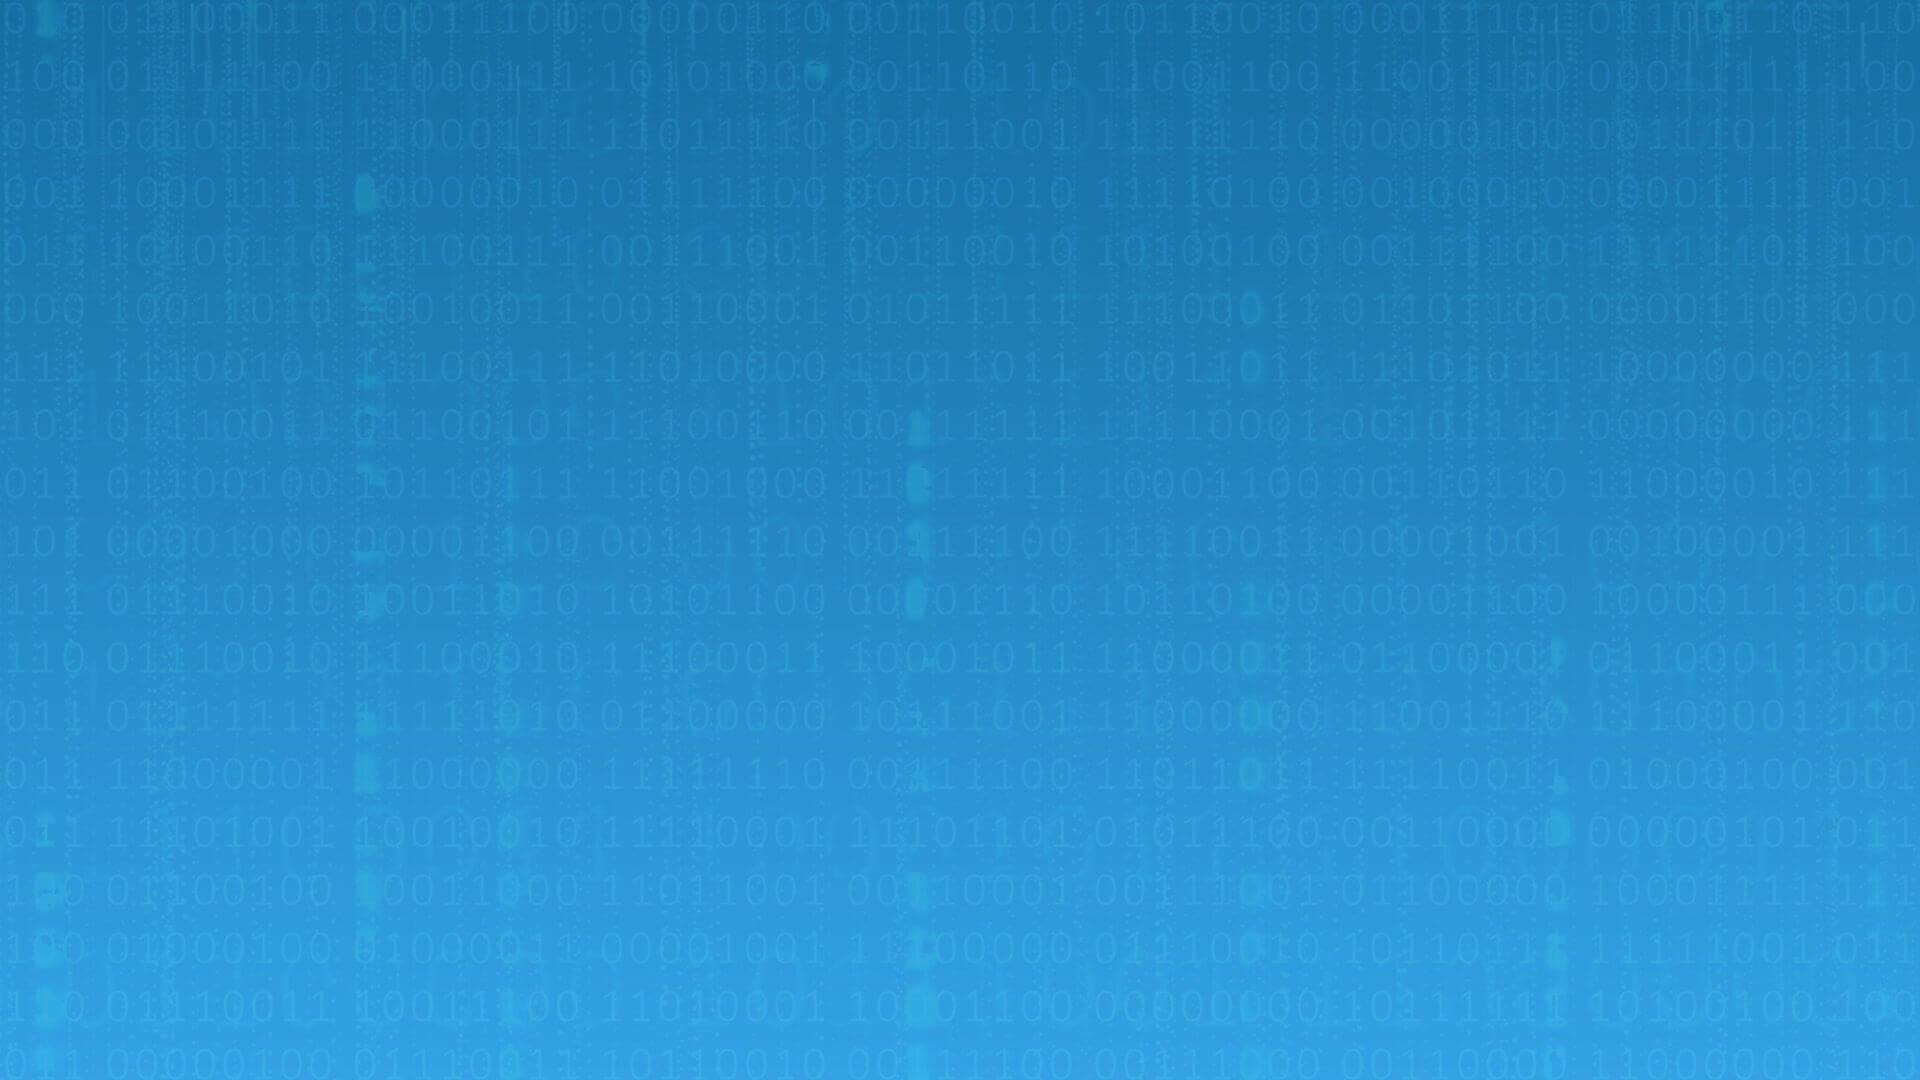 SecPoint Nederland - code netwerkbeveiliging